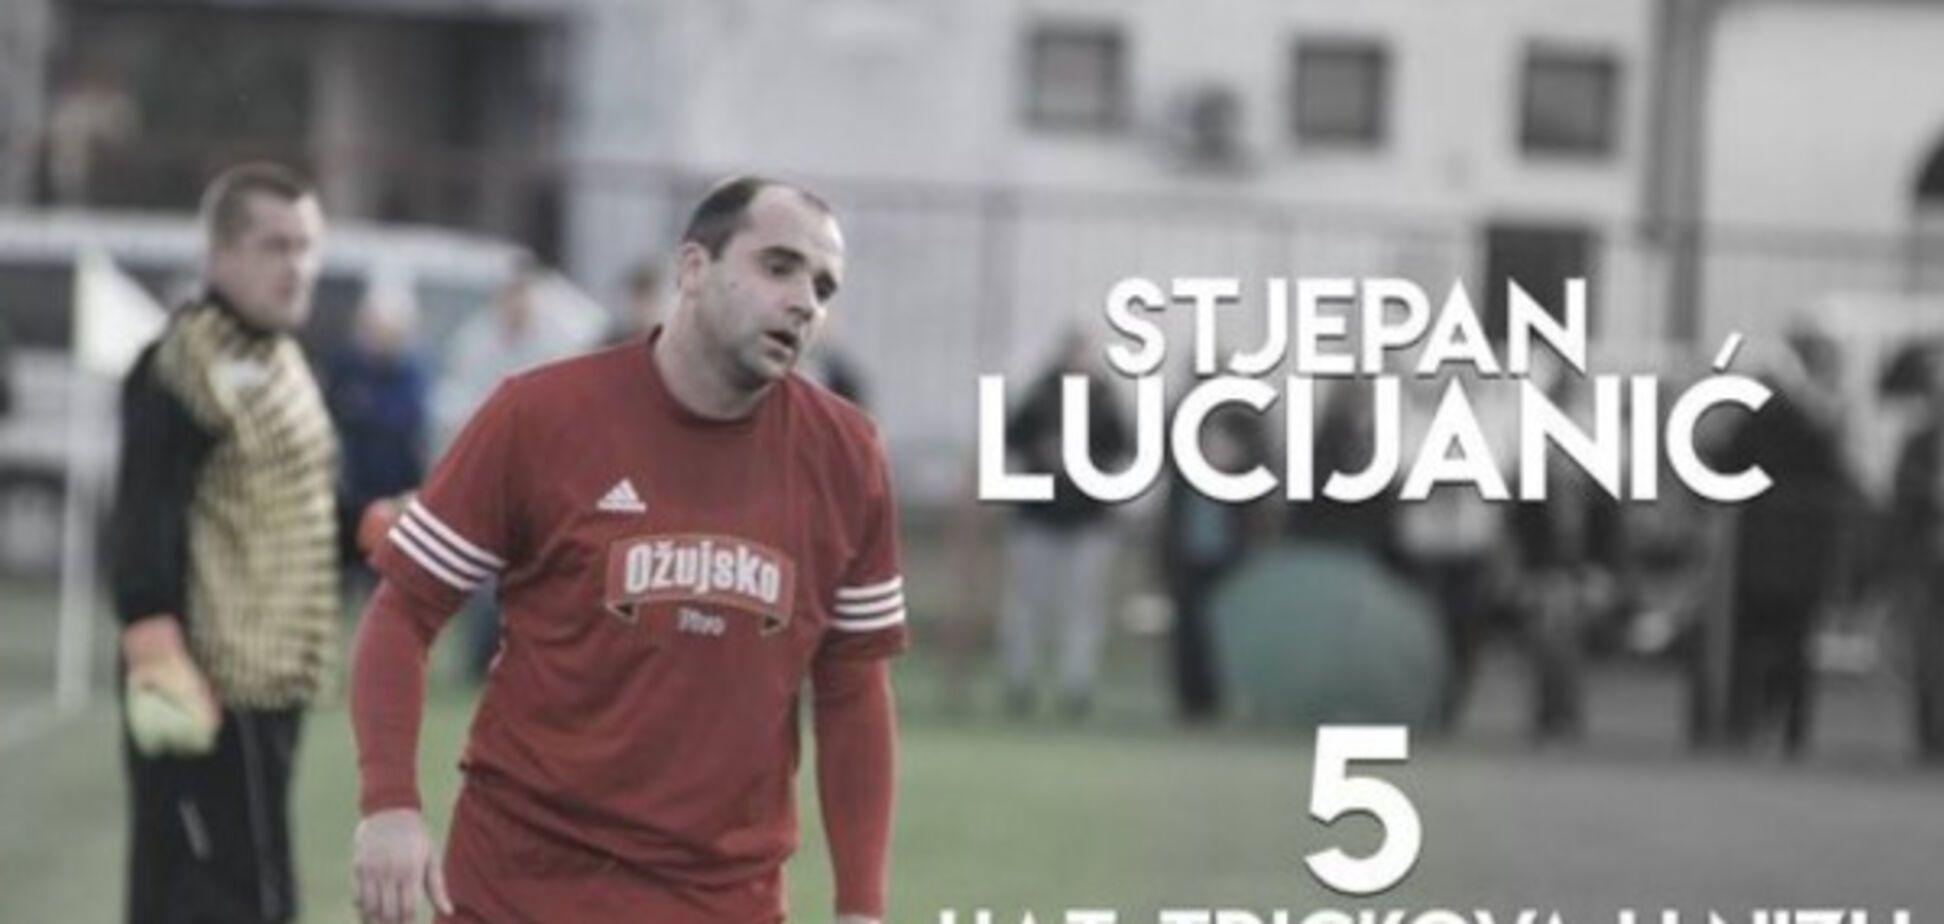 Степан Луциянич